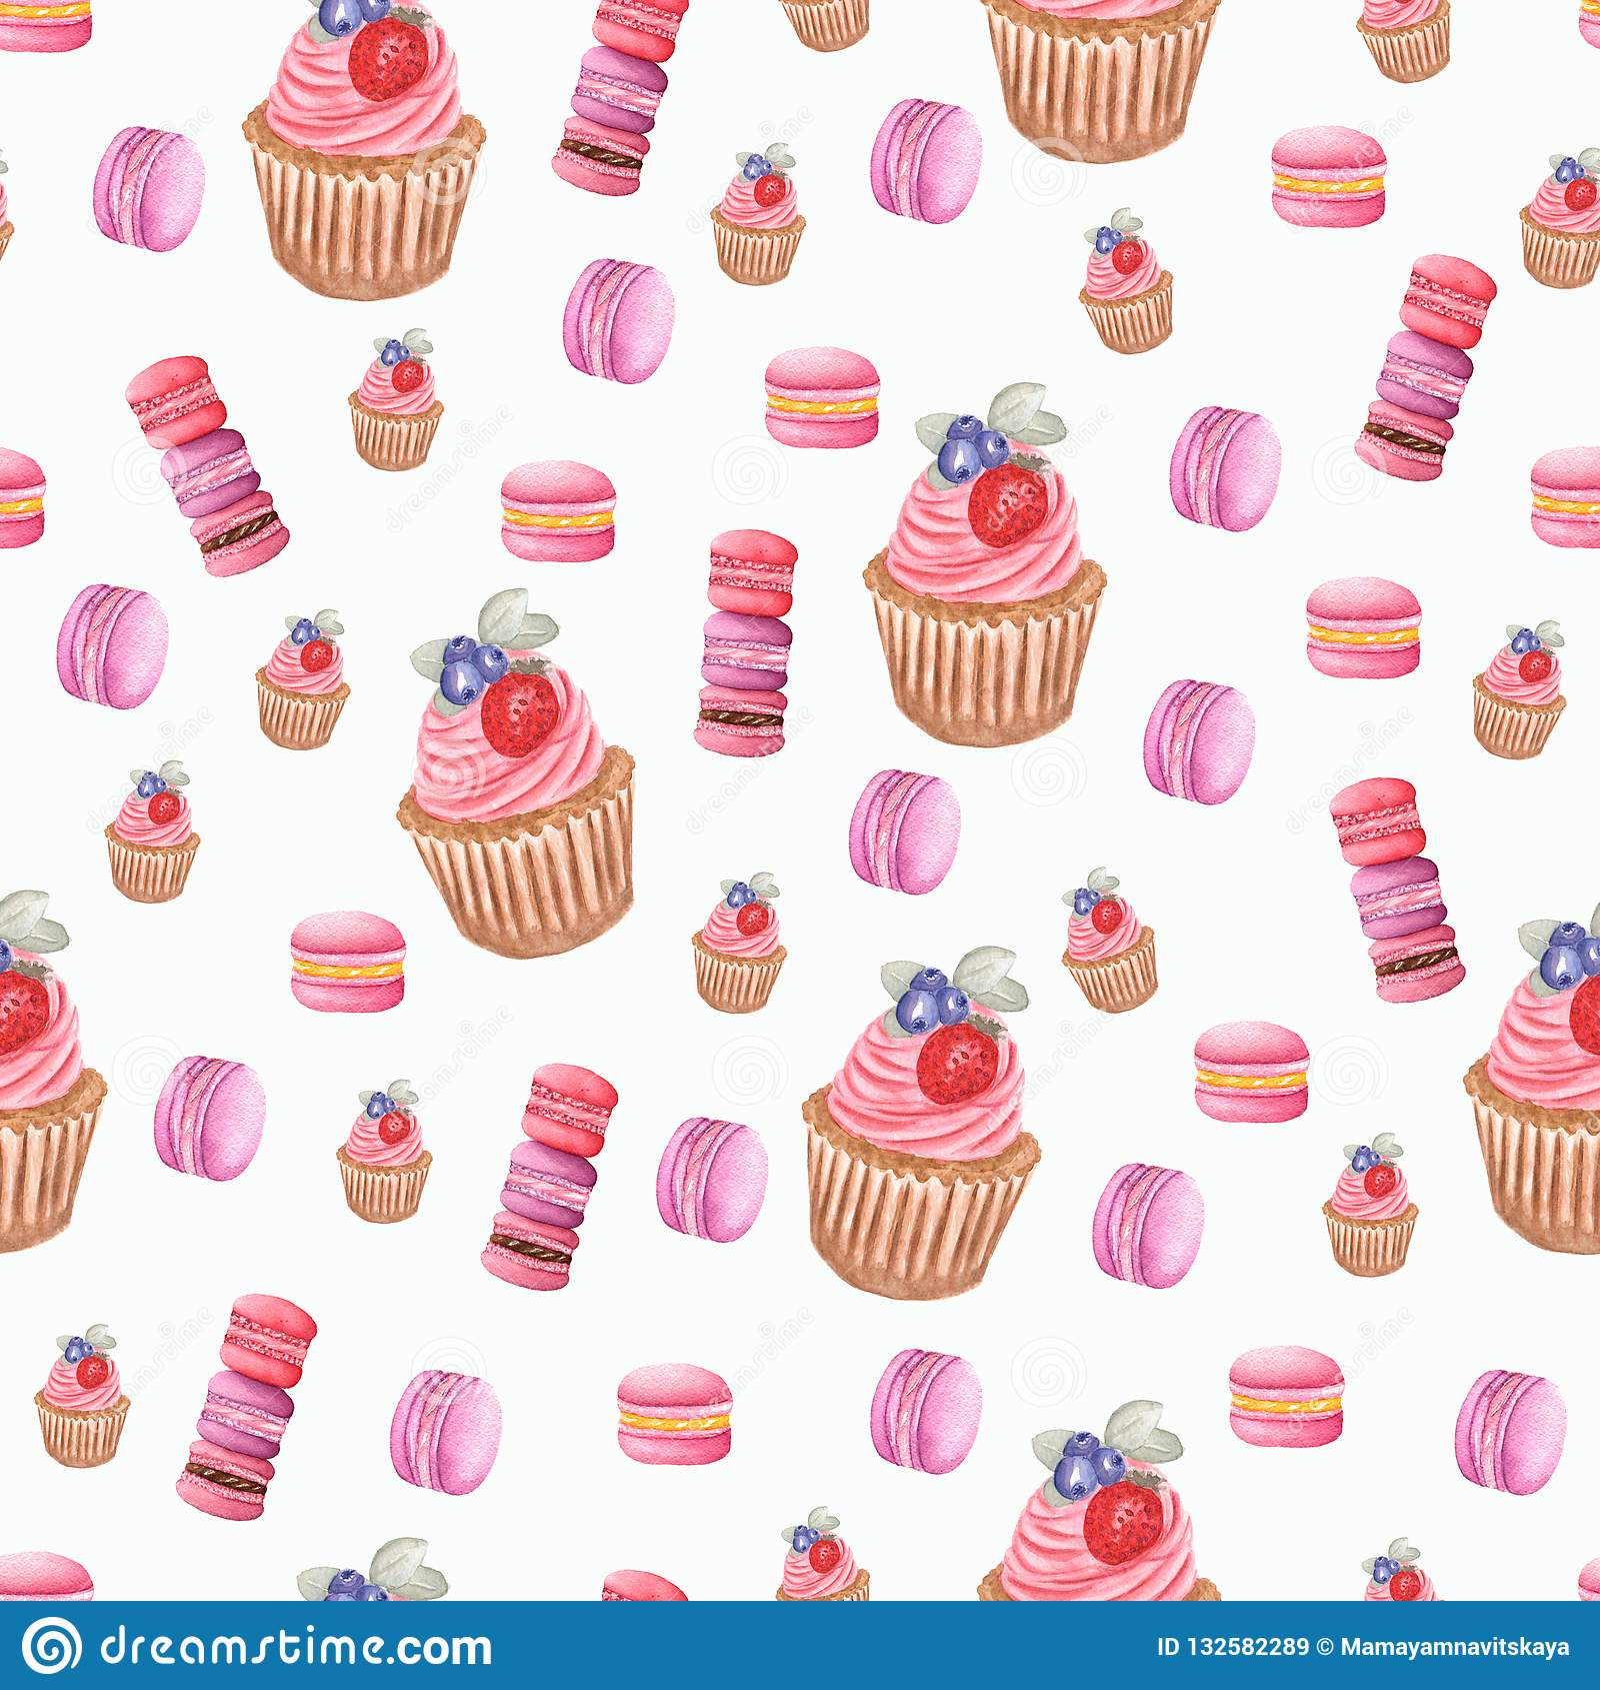 Aquarell macarons in den purpurroten, roten und rosa Farben